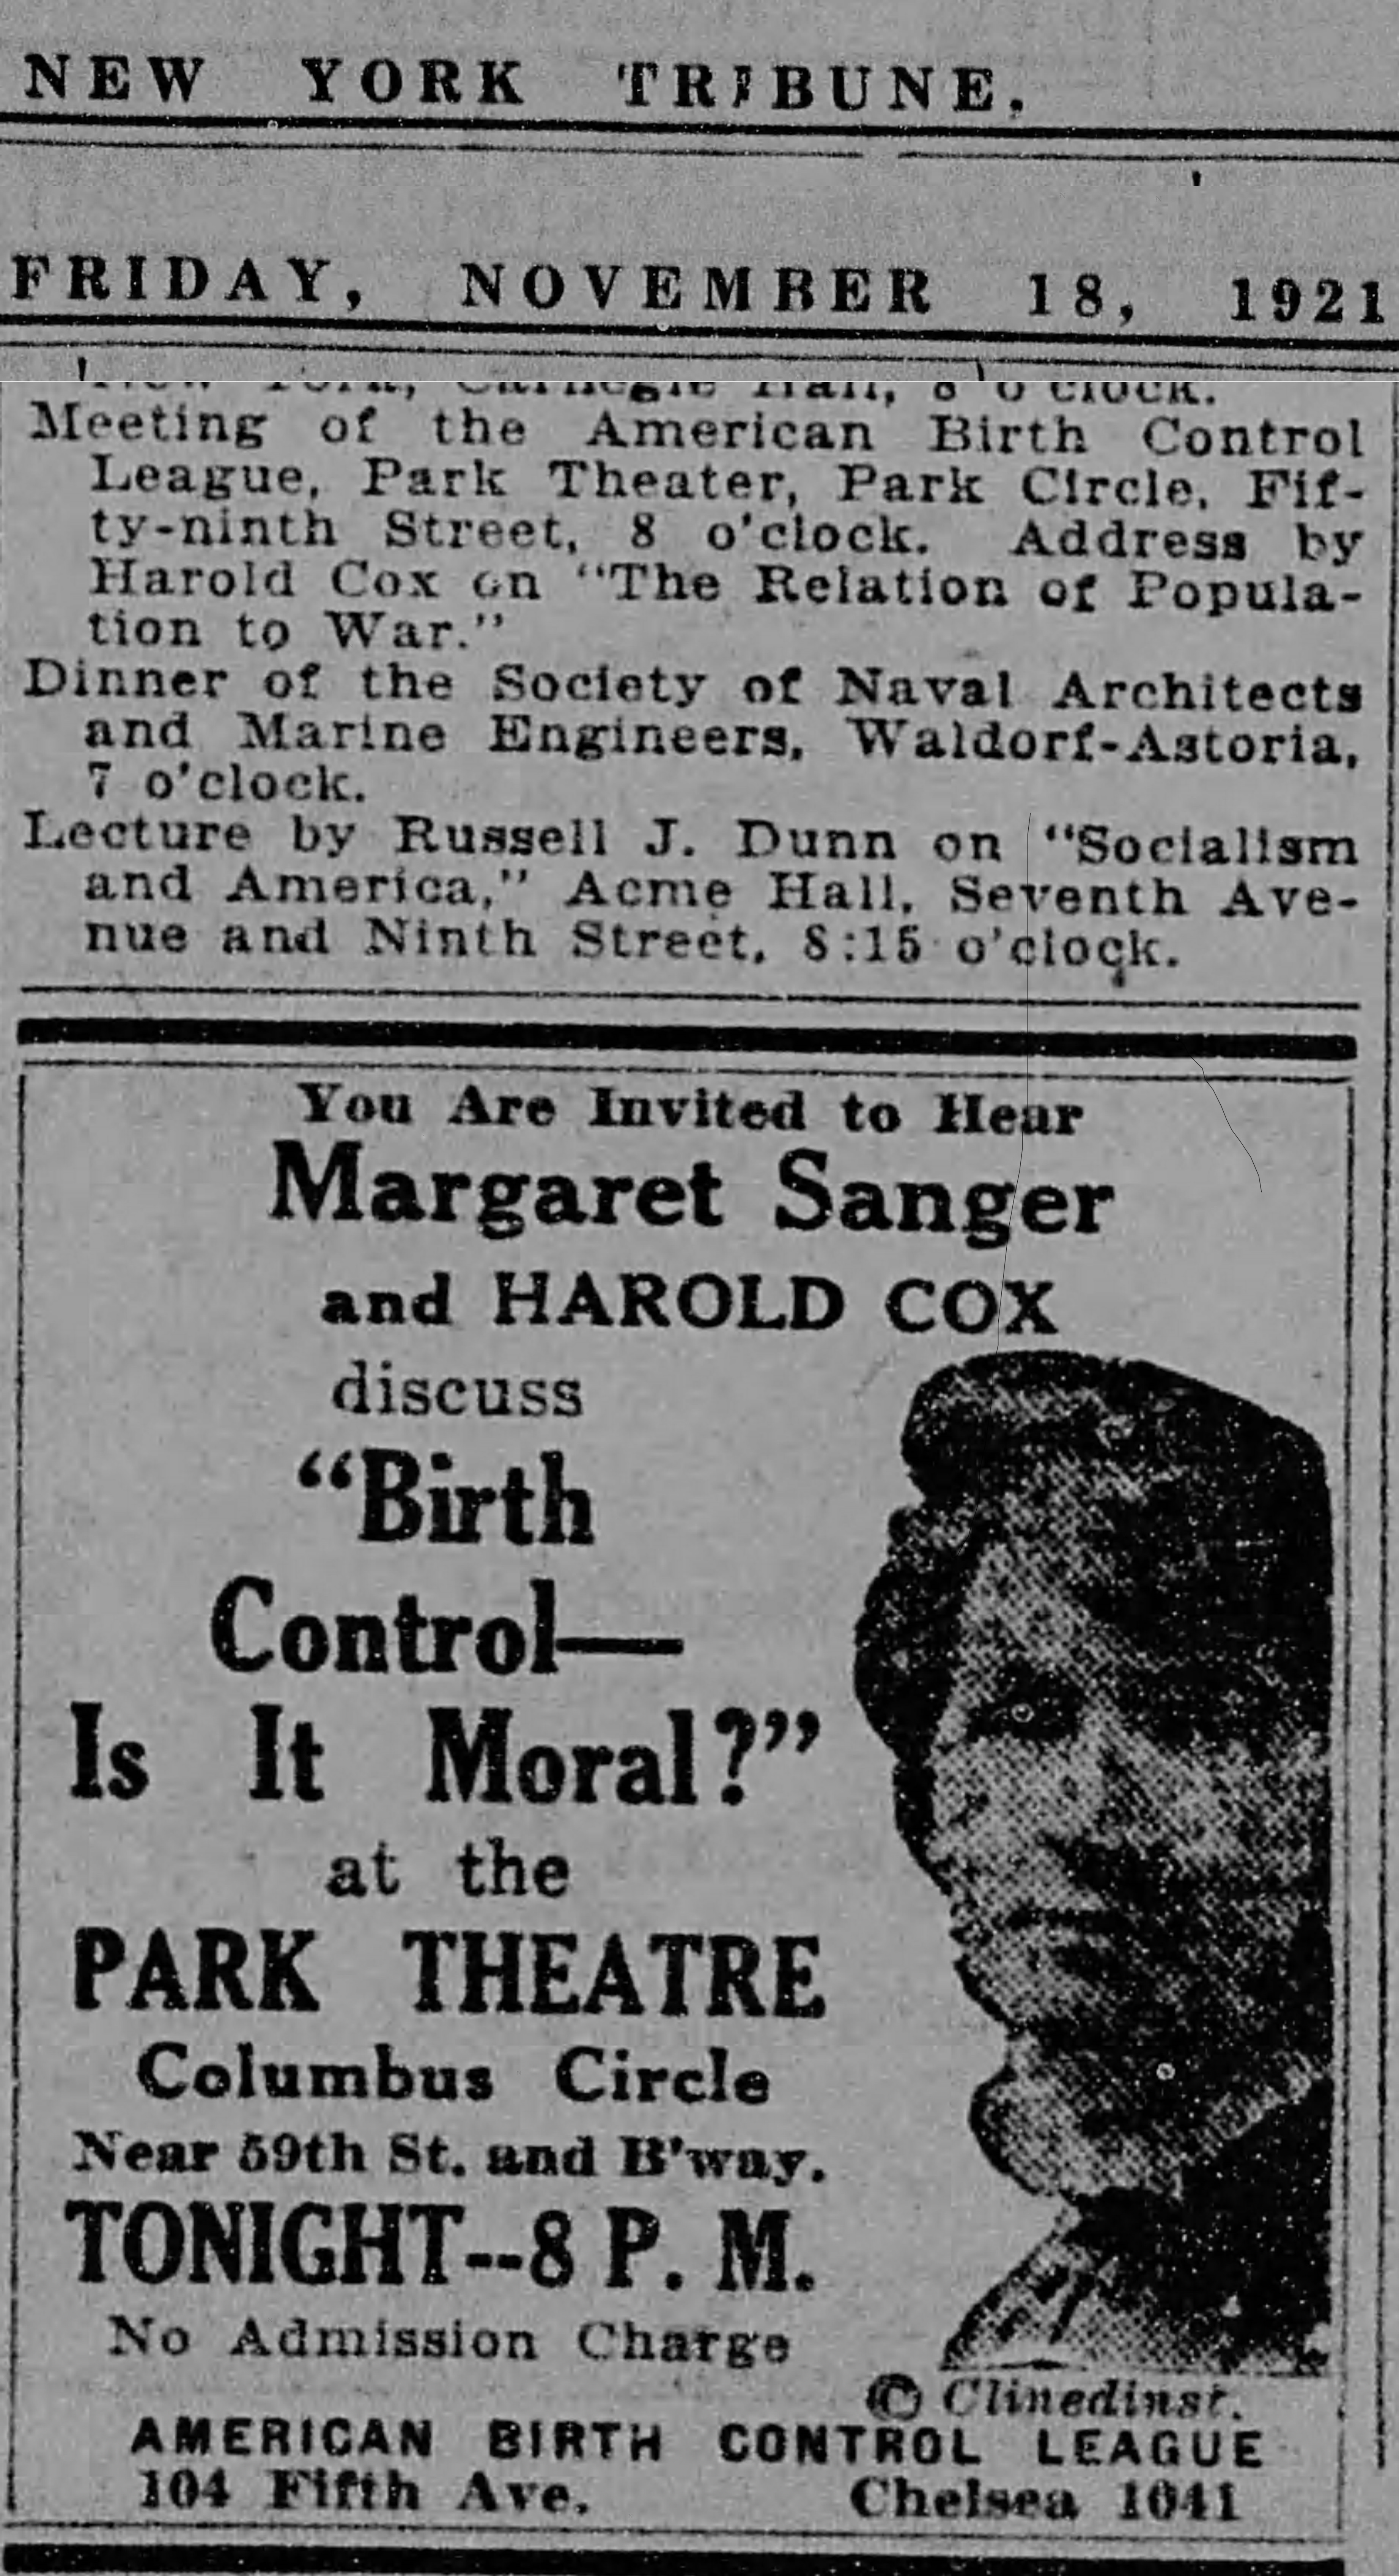 New York Tribune Fri Nov 18 1921, Park Theater Cox Speech